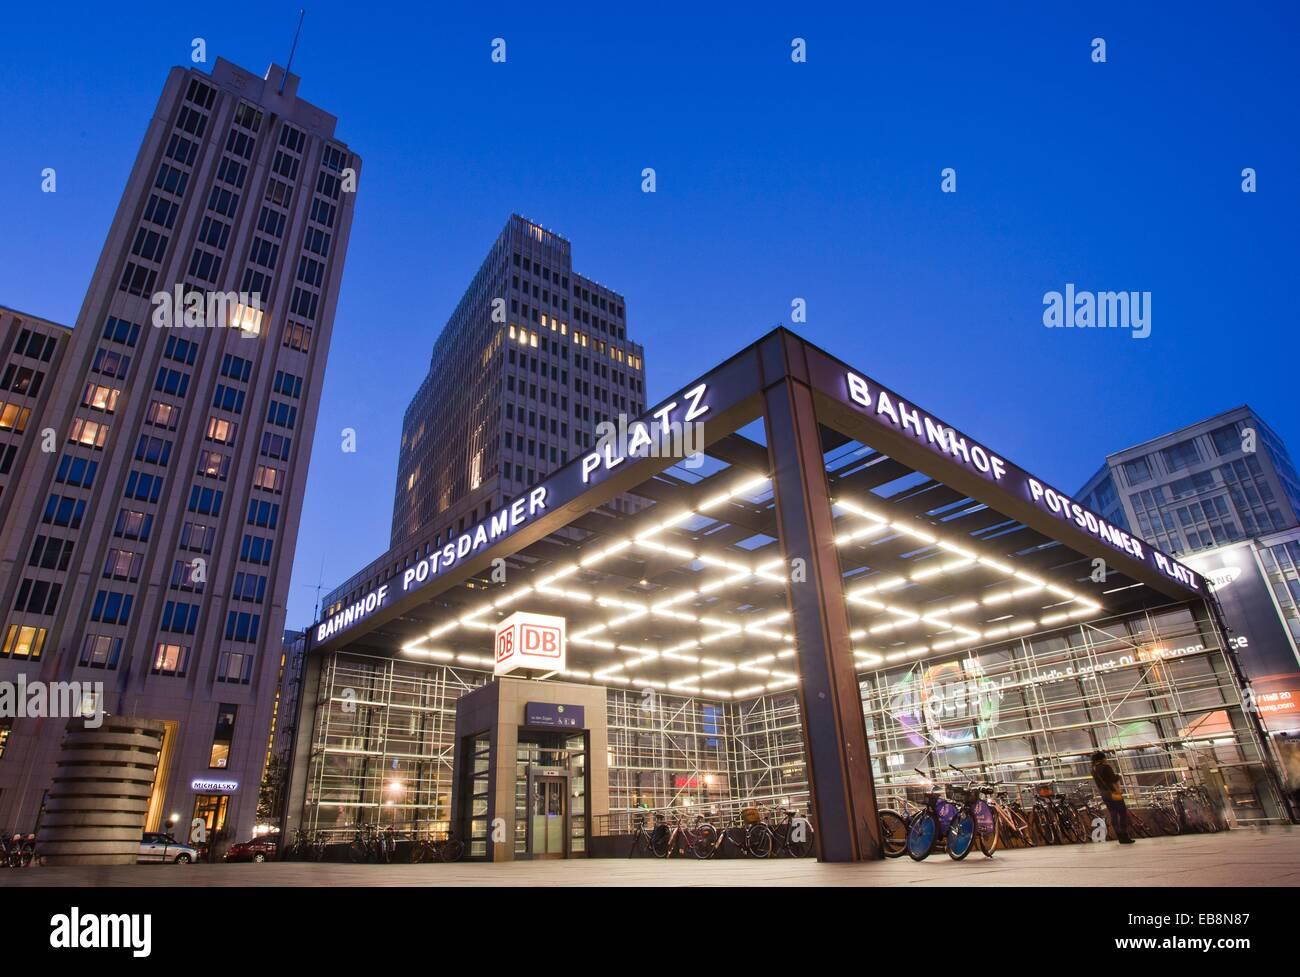 Casino Potsdamer Platz